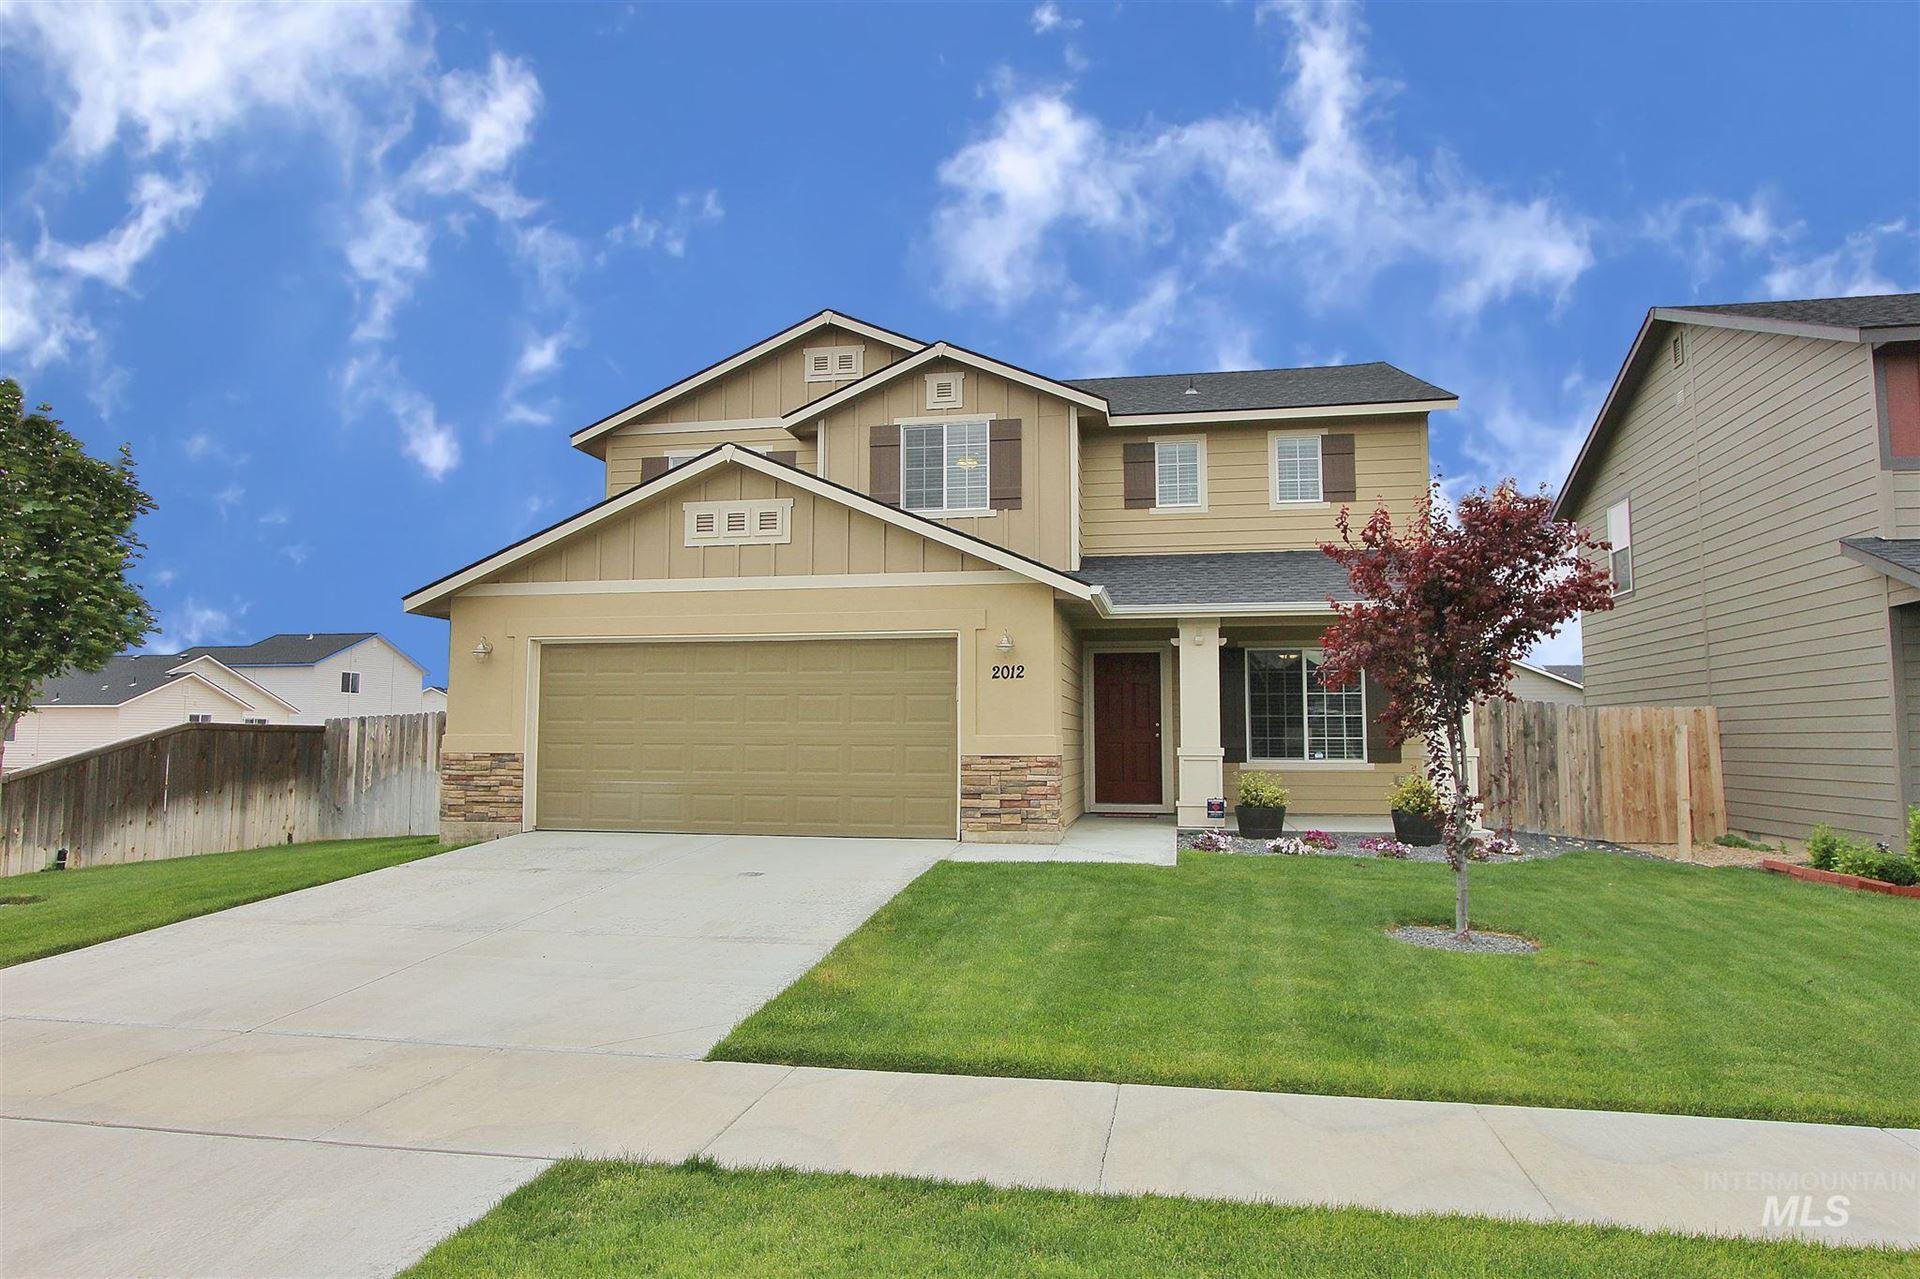 2012 W Shoshone Street, Nampa, ID 83651 - MLS#: 98770863